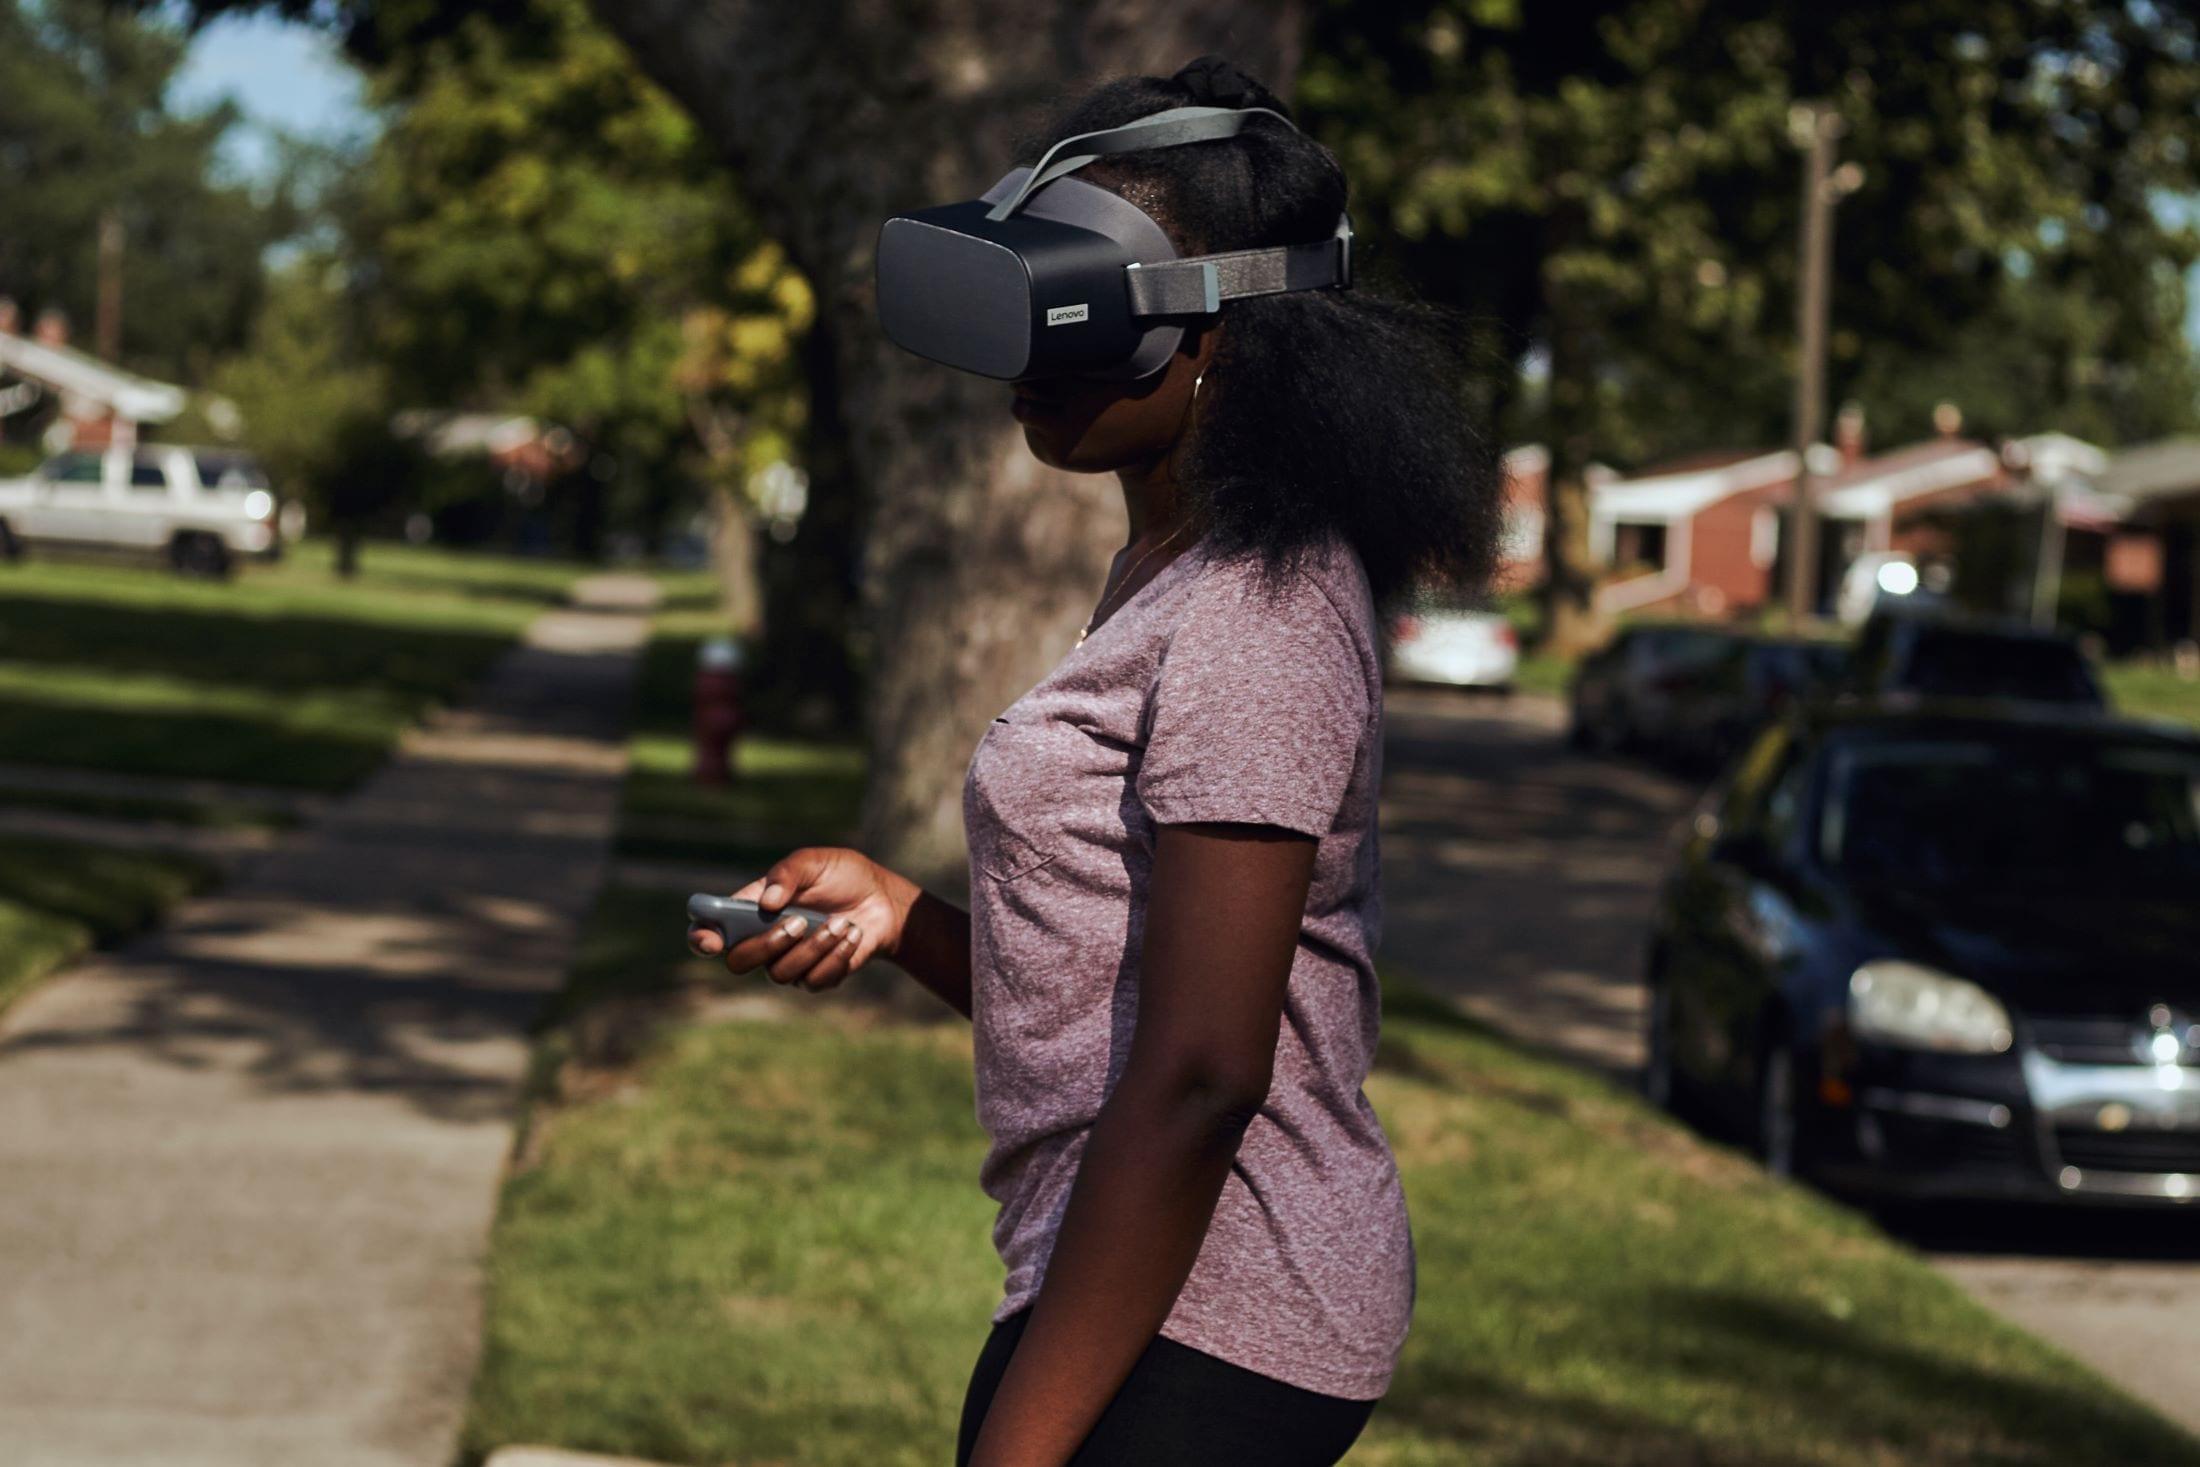 New Realities - USA - Kemi Dauda using a Lenovo VR headset outside